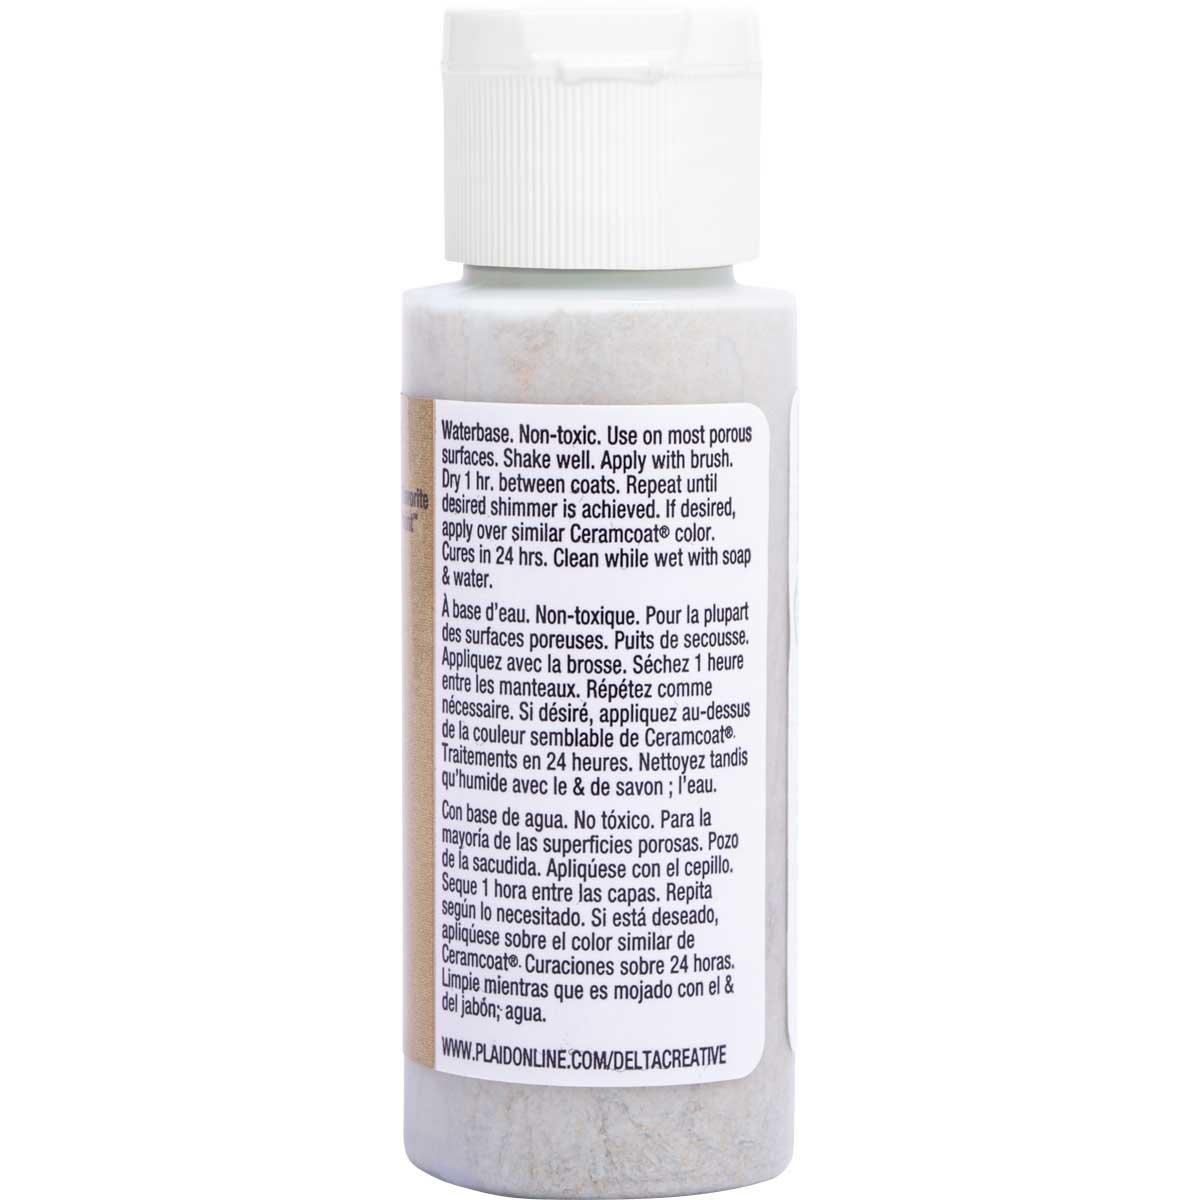 Delta Ceramcoat ® Acrylic Paint - Glitter Gold, 2 oz. - 03010